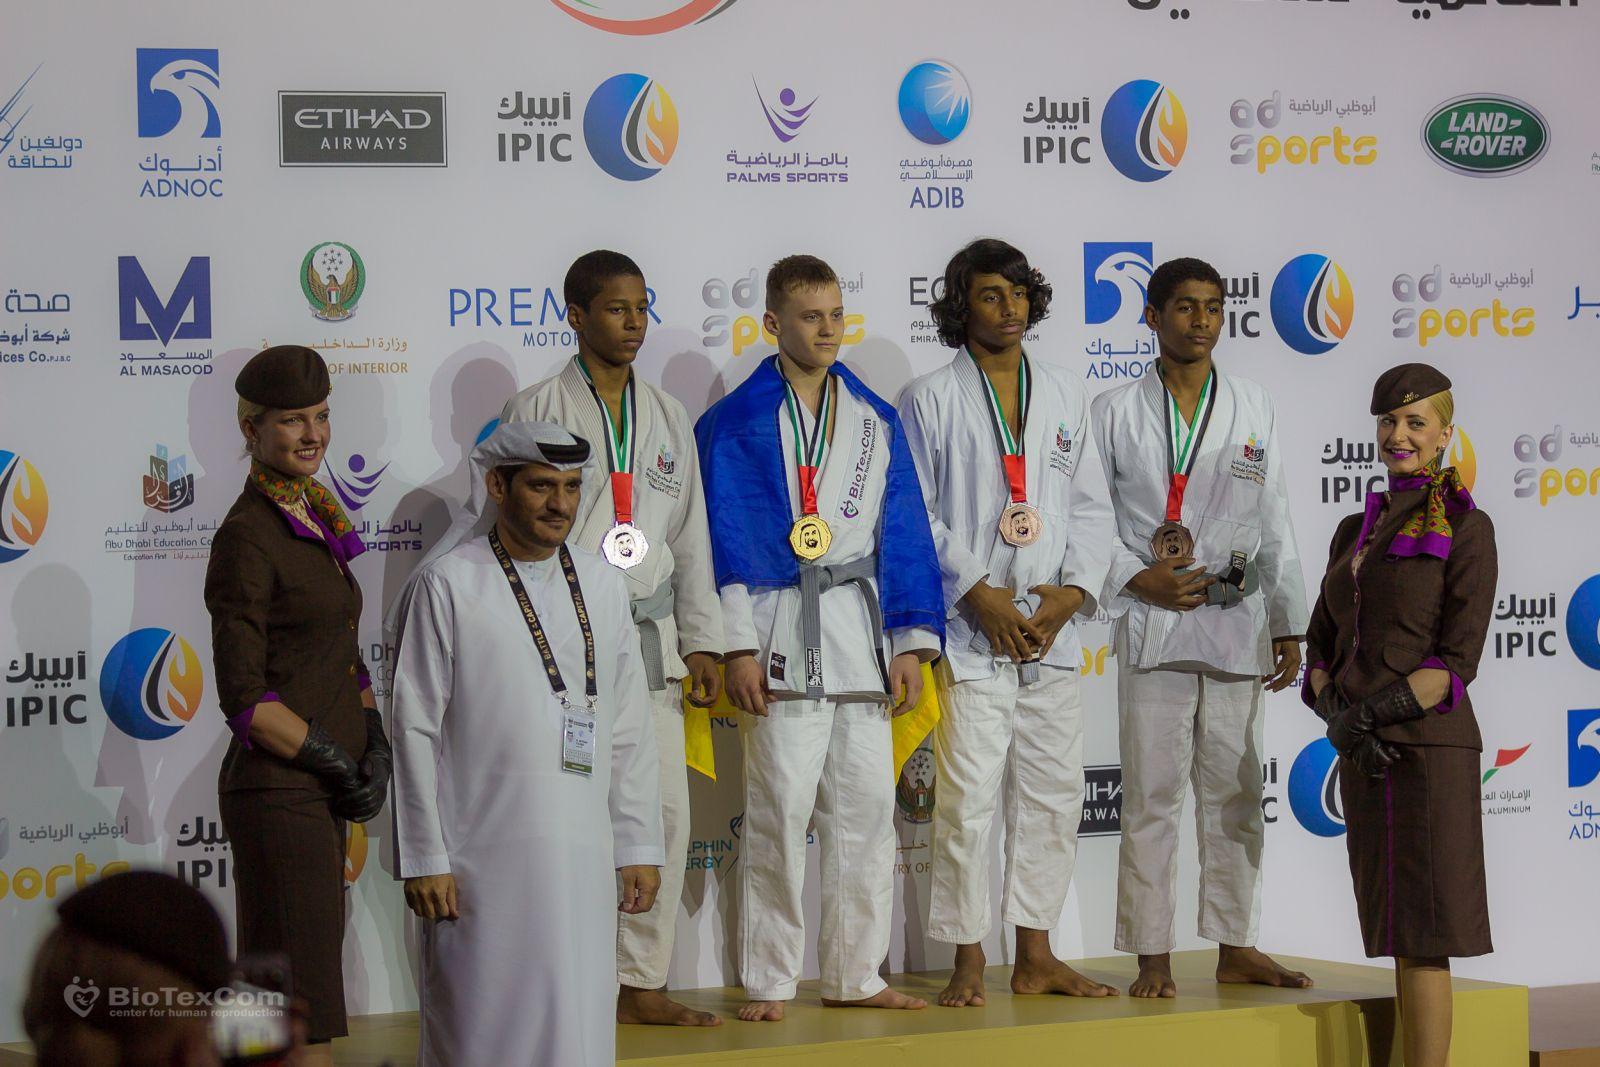 krasovskiy-sergey_Abu-Dhabi-2017_48